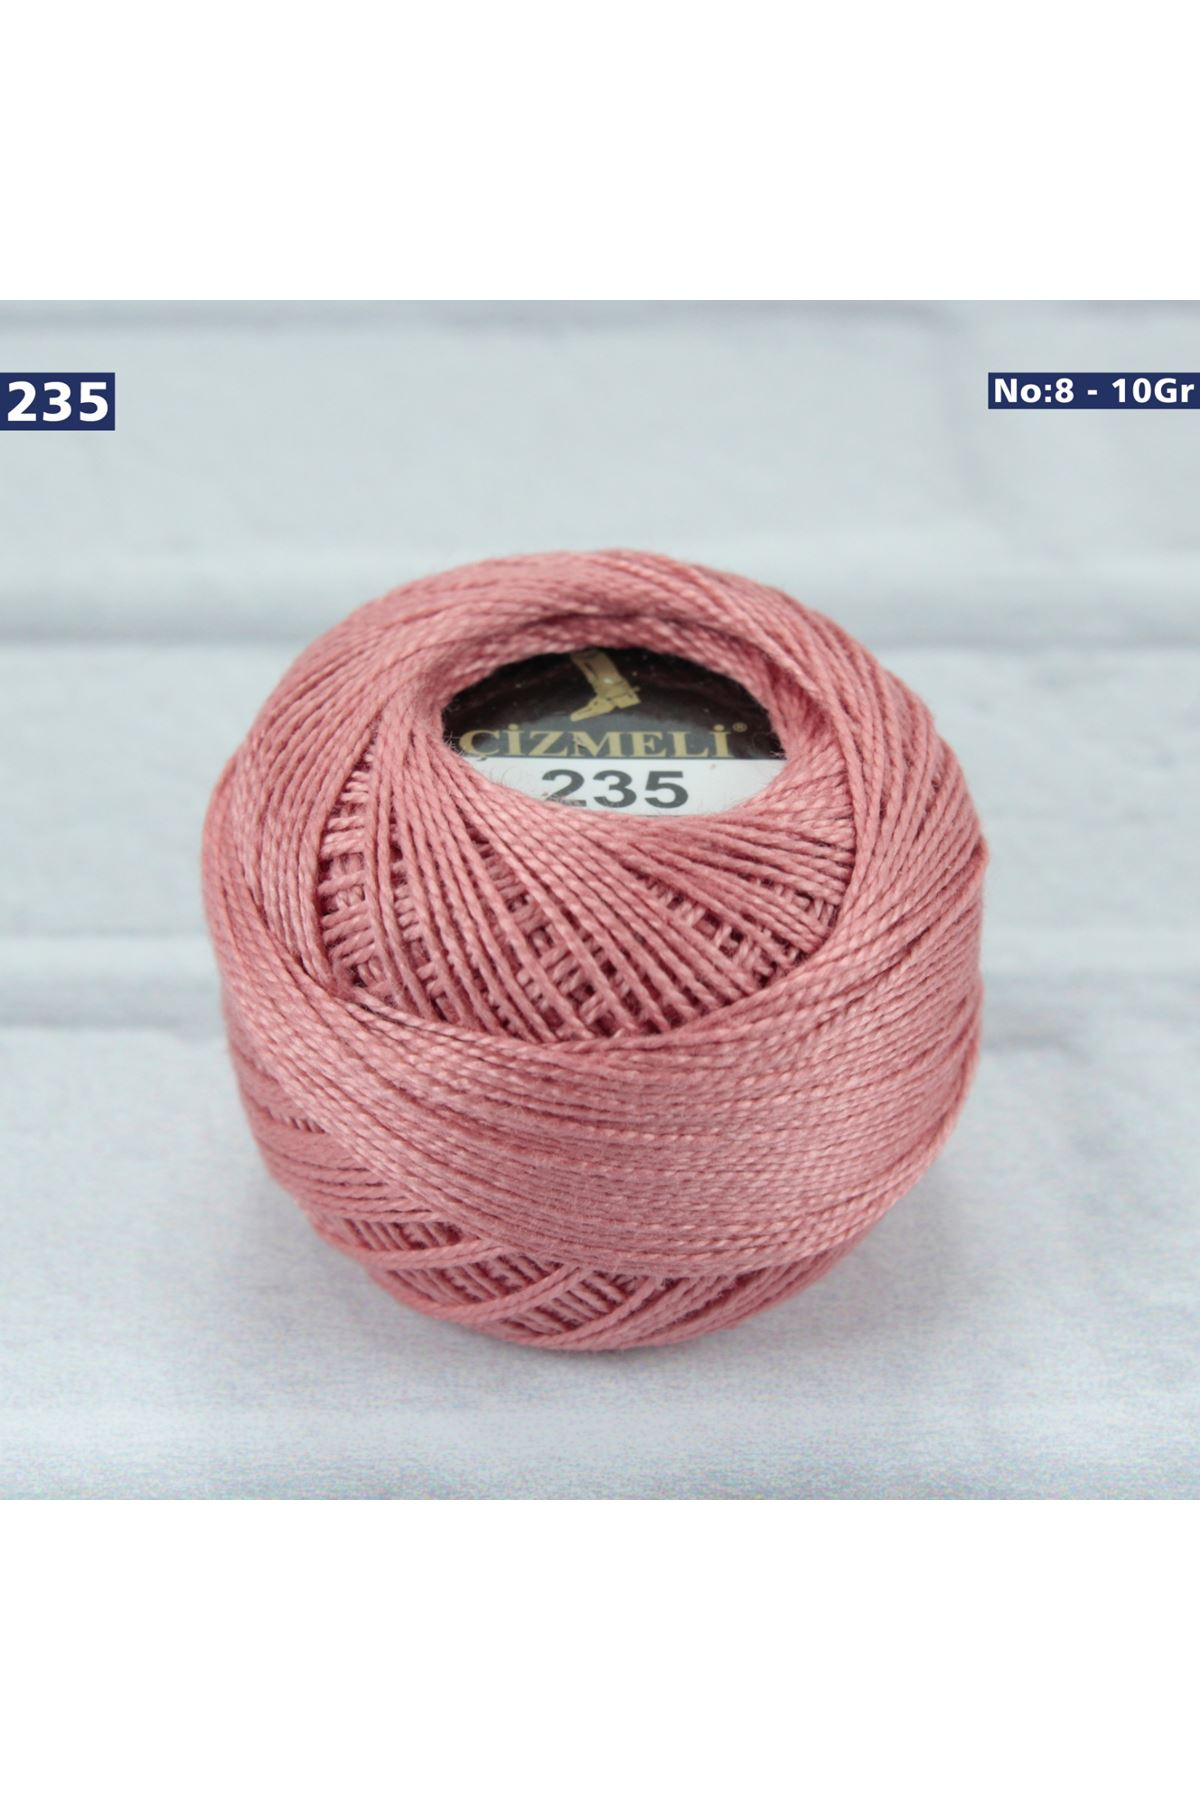 Çizmeli Cotton Perle Nakış İpliği No: 235